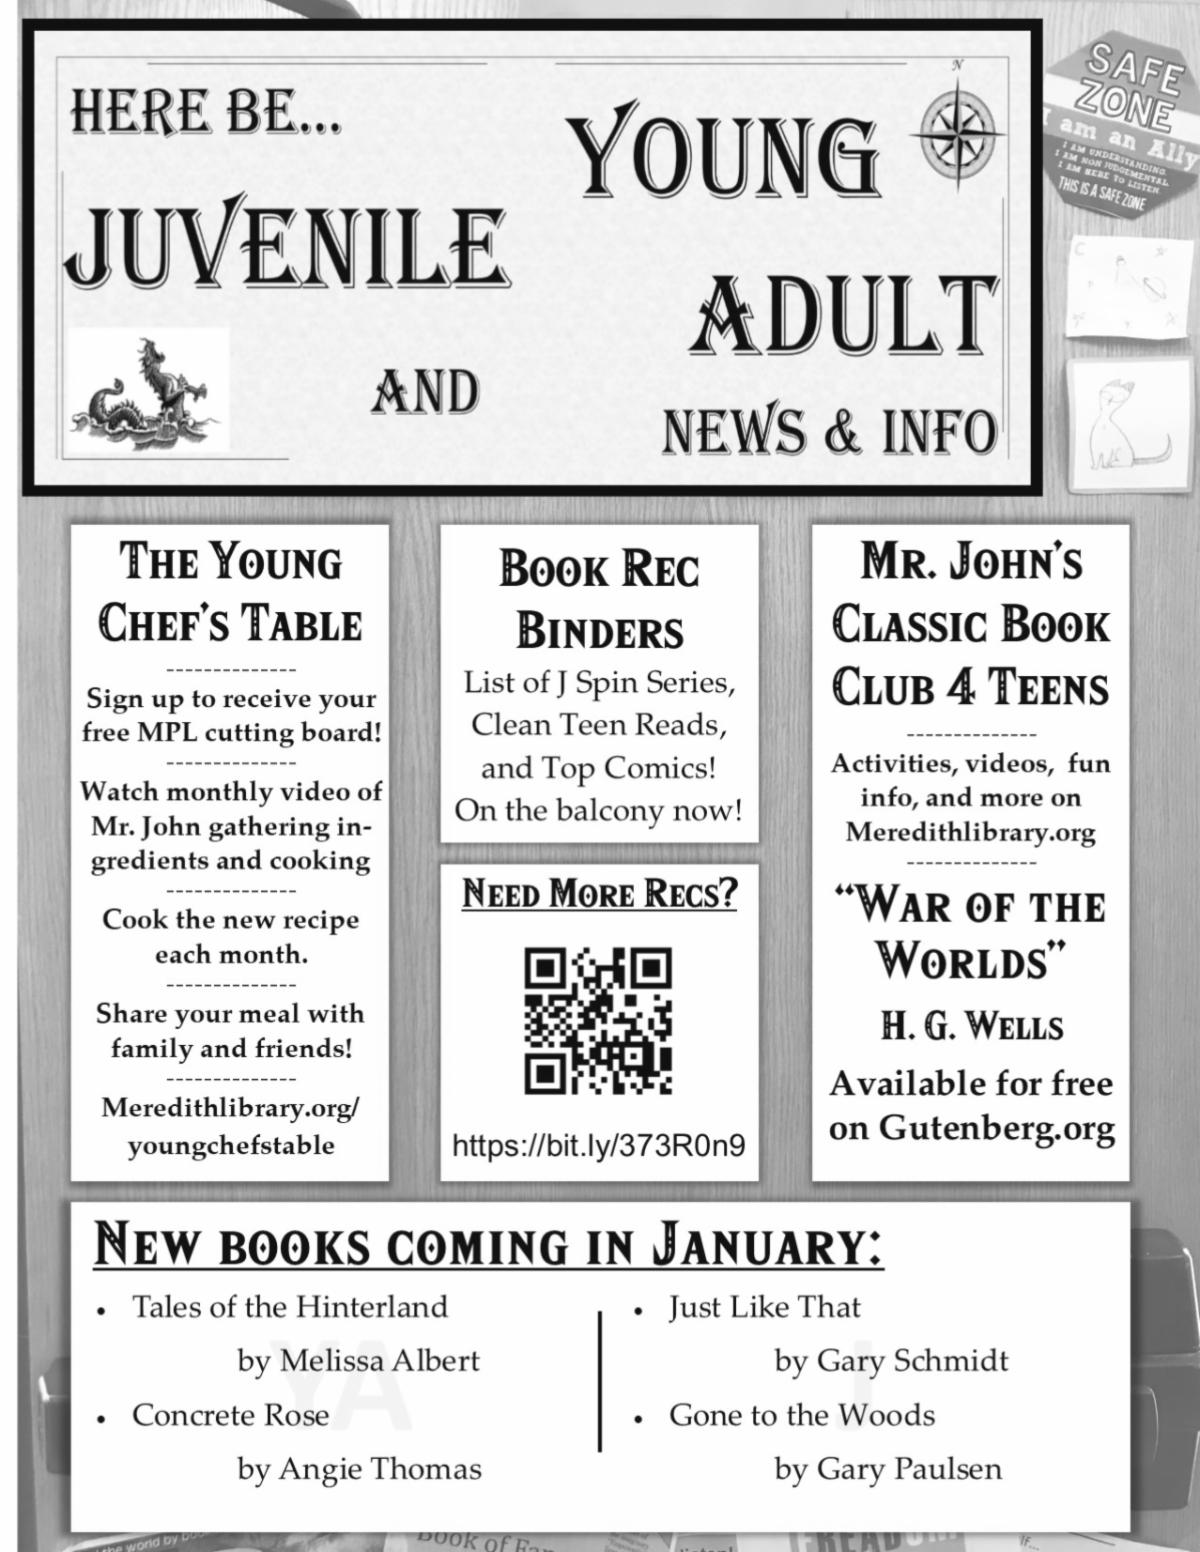 Teen January activities